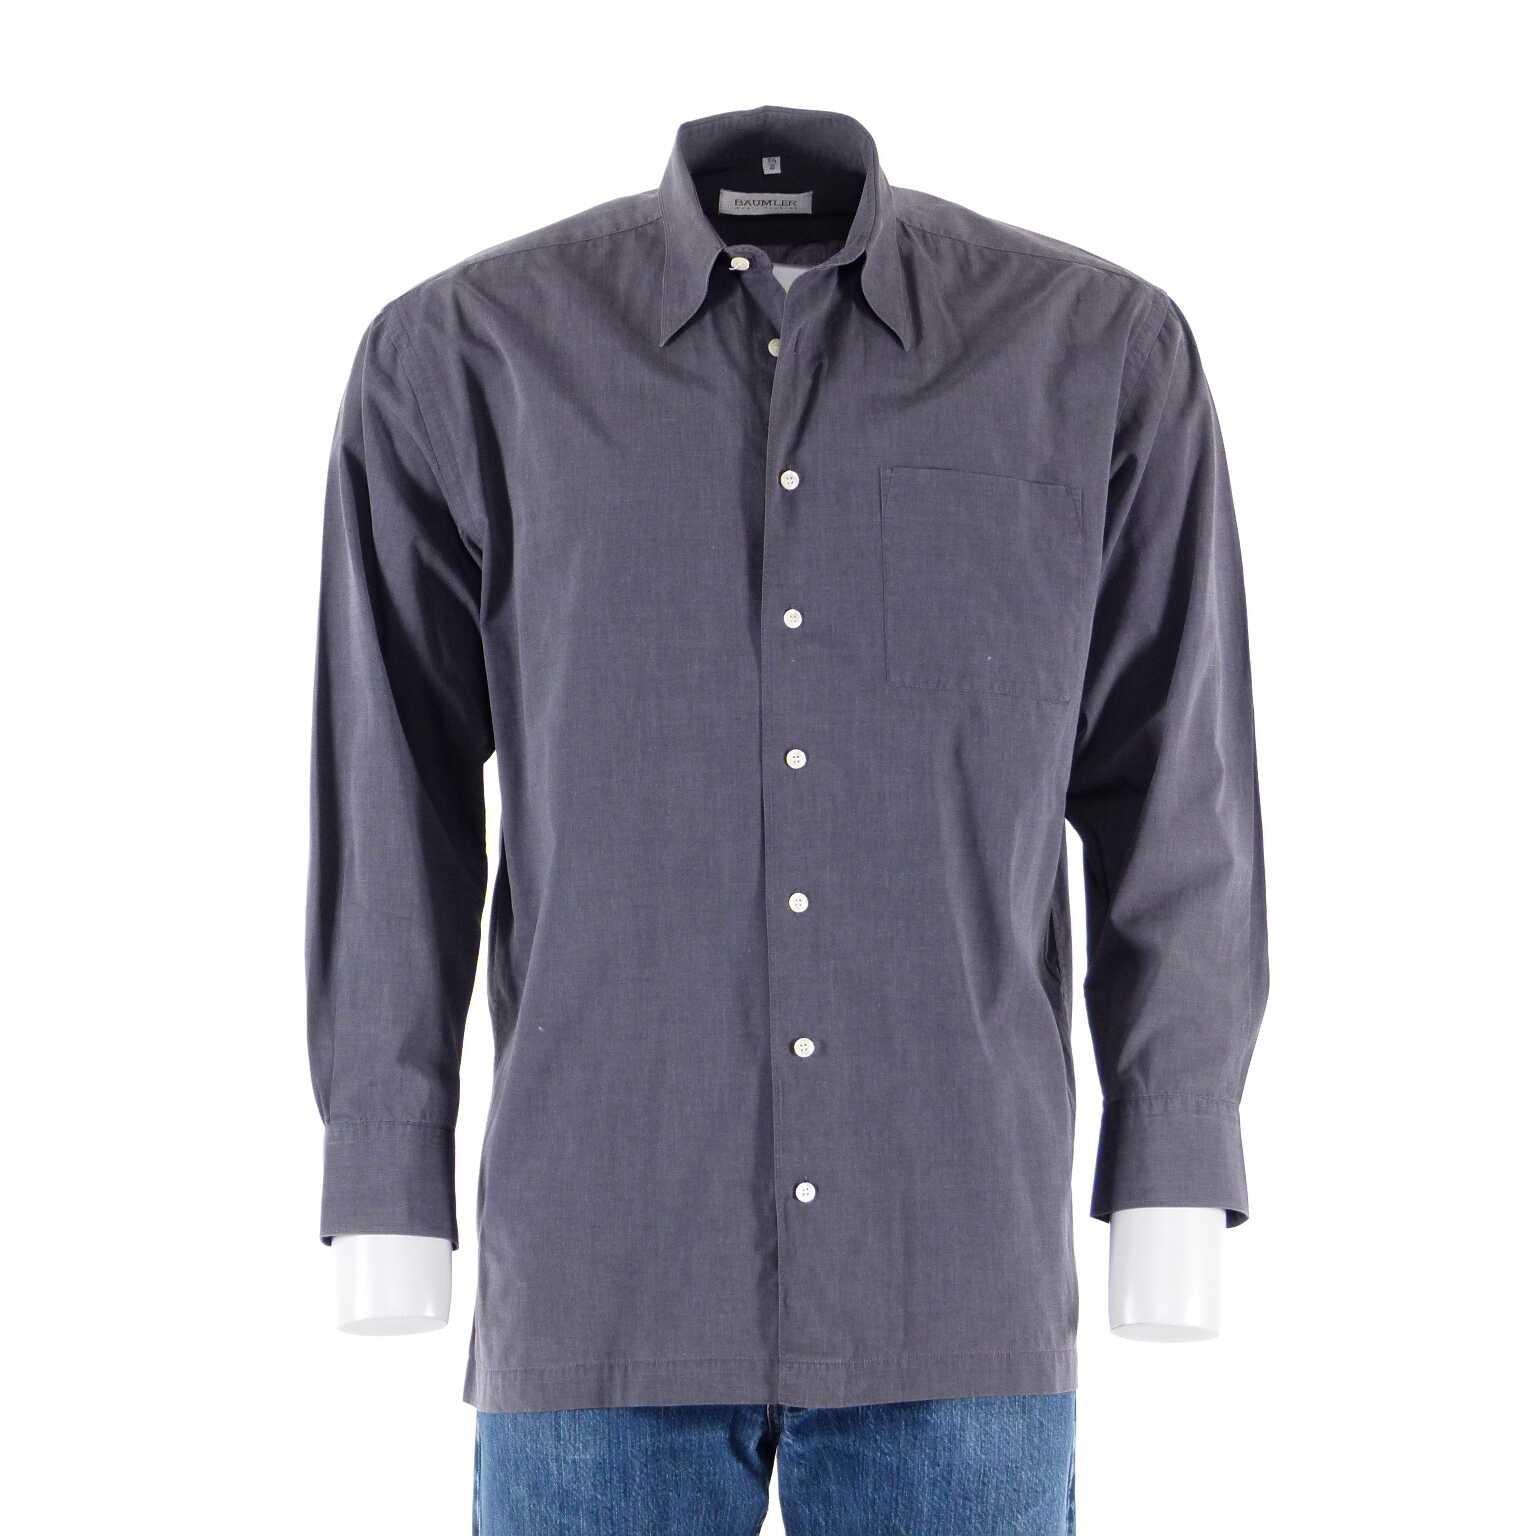 b umler langarm hemd gr 40 m grau ahb men hemden. Black Bedroom Furniture Sets. Home Design Ideas